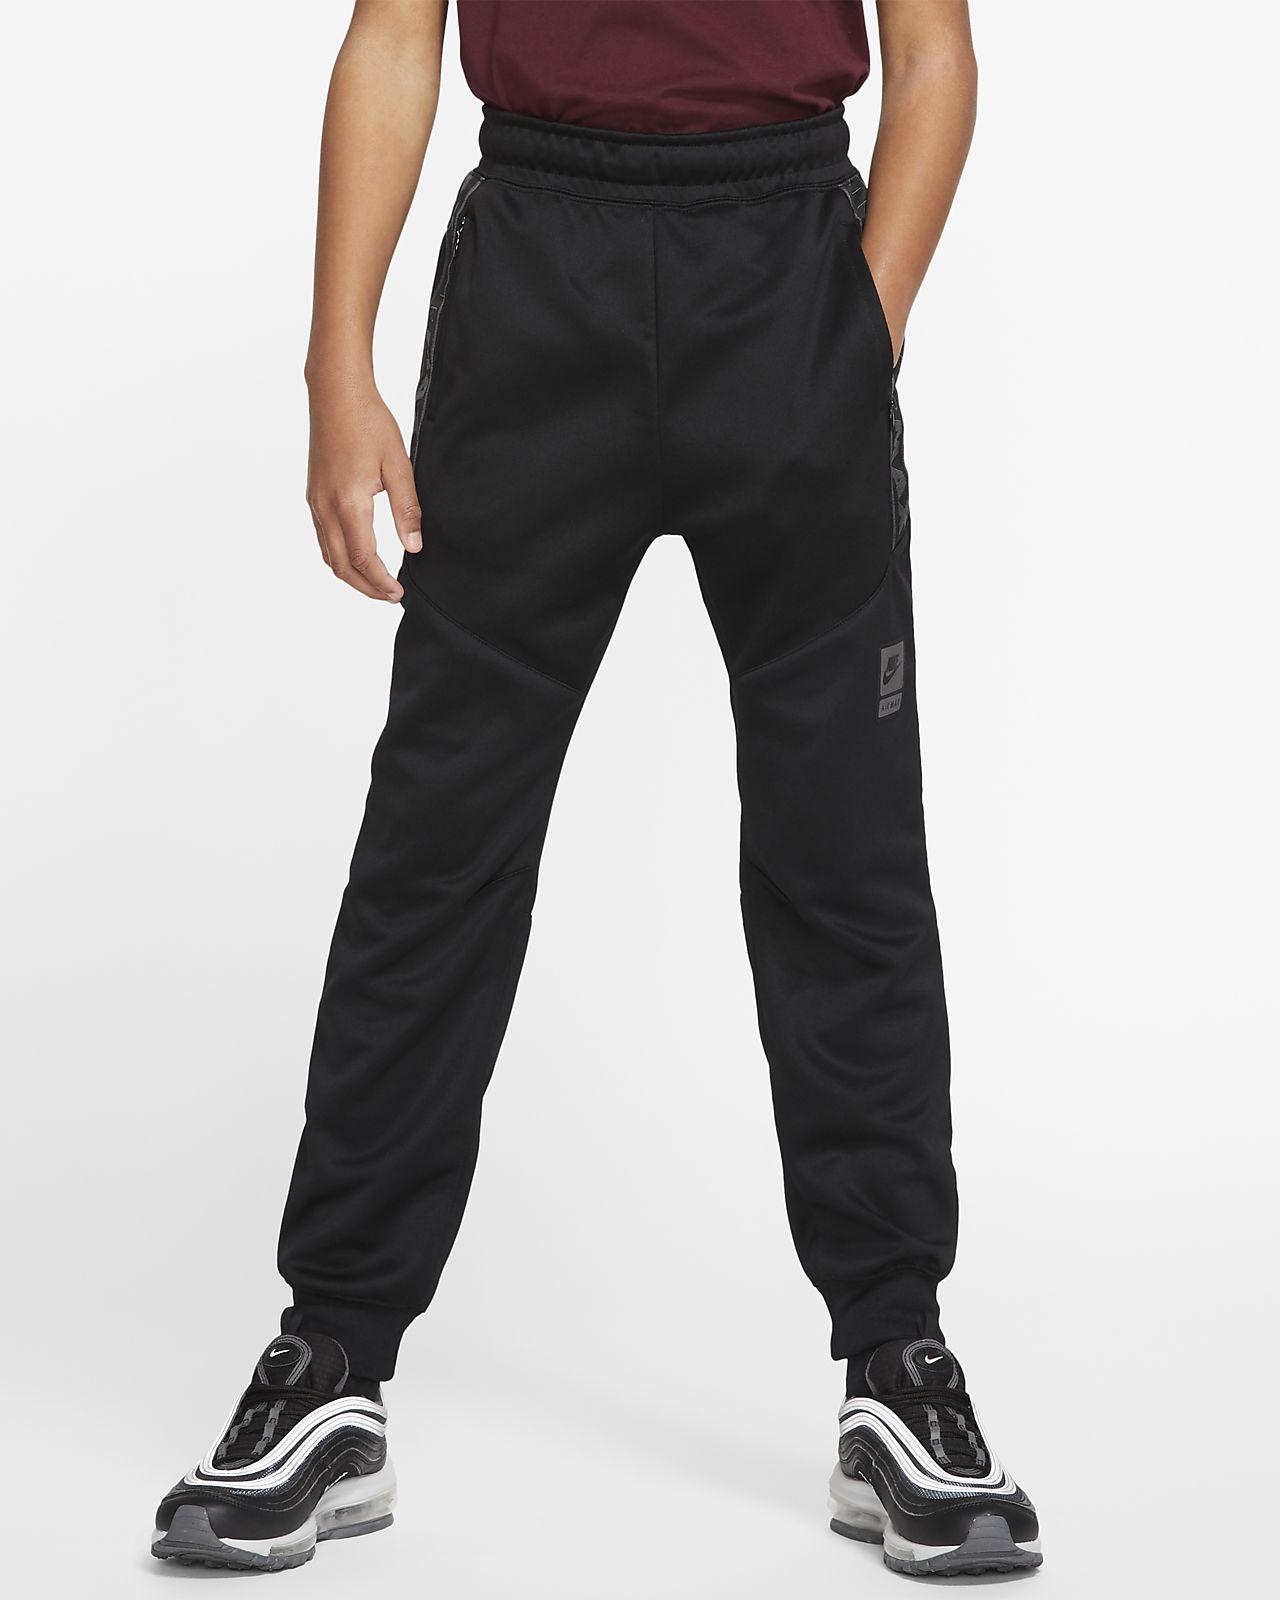 Nike Sportswear Air Max Older Kids' (Boys') Trousers